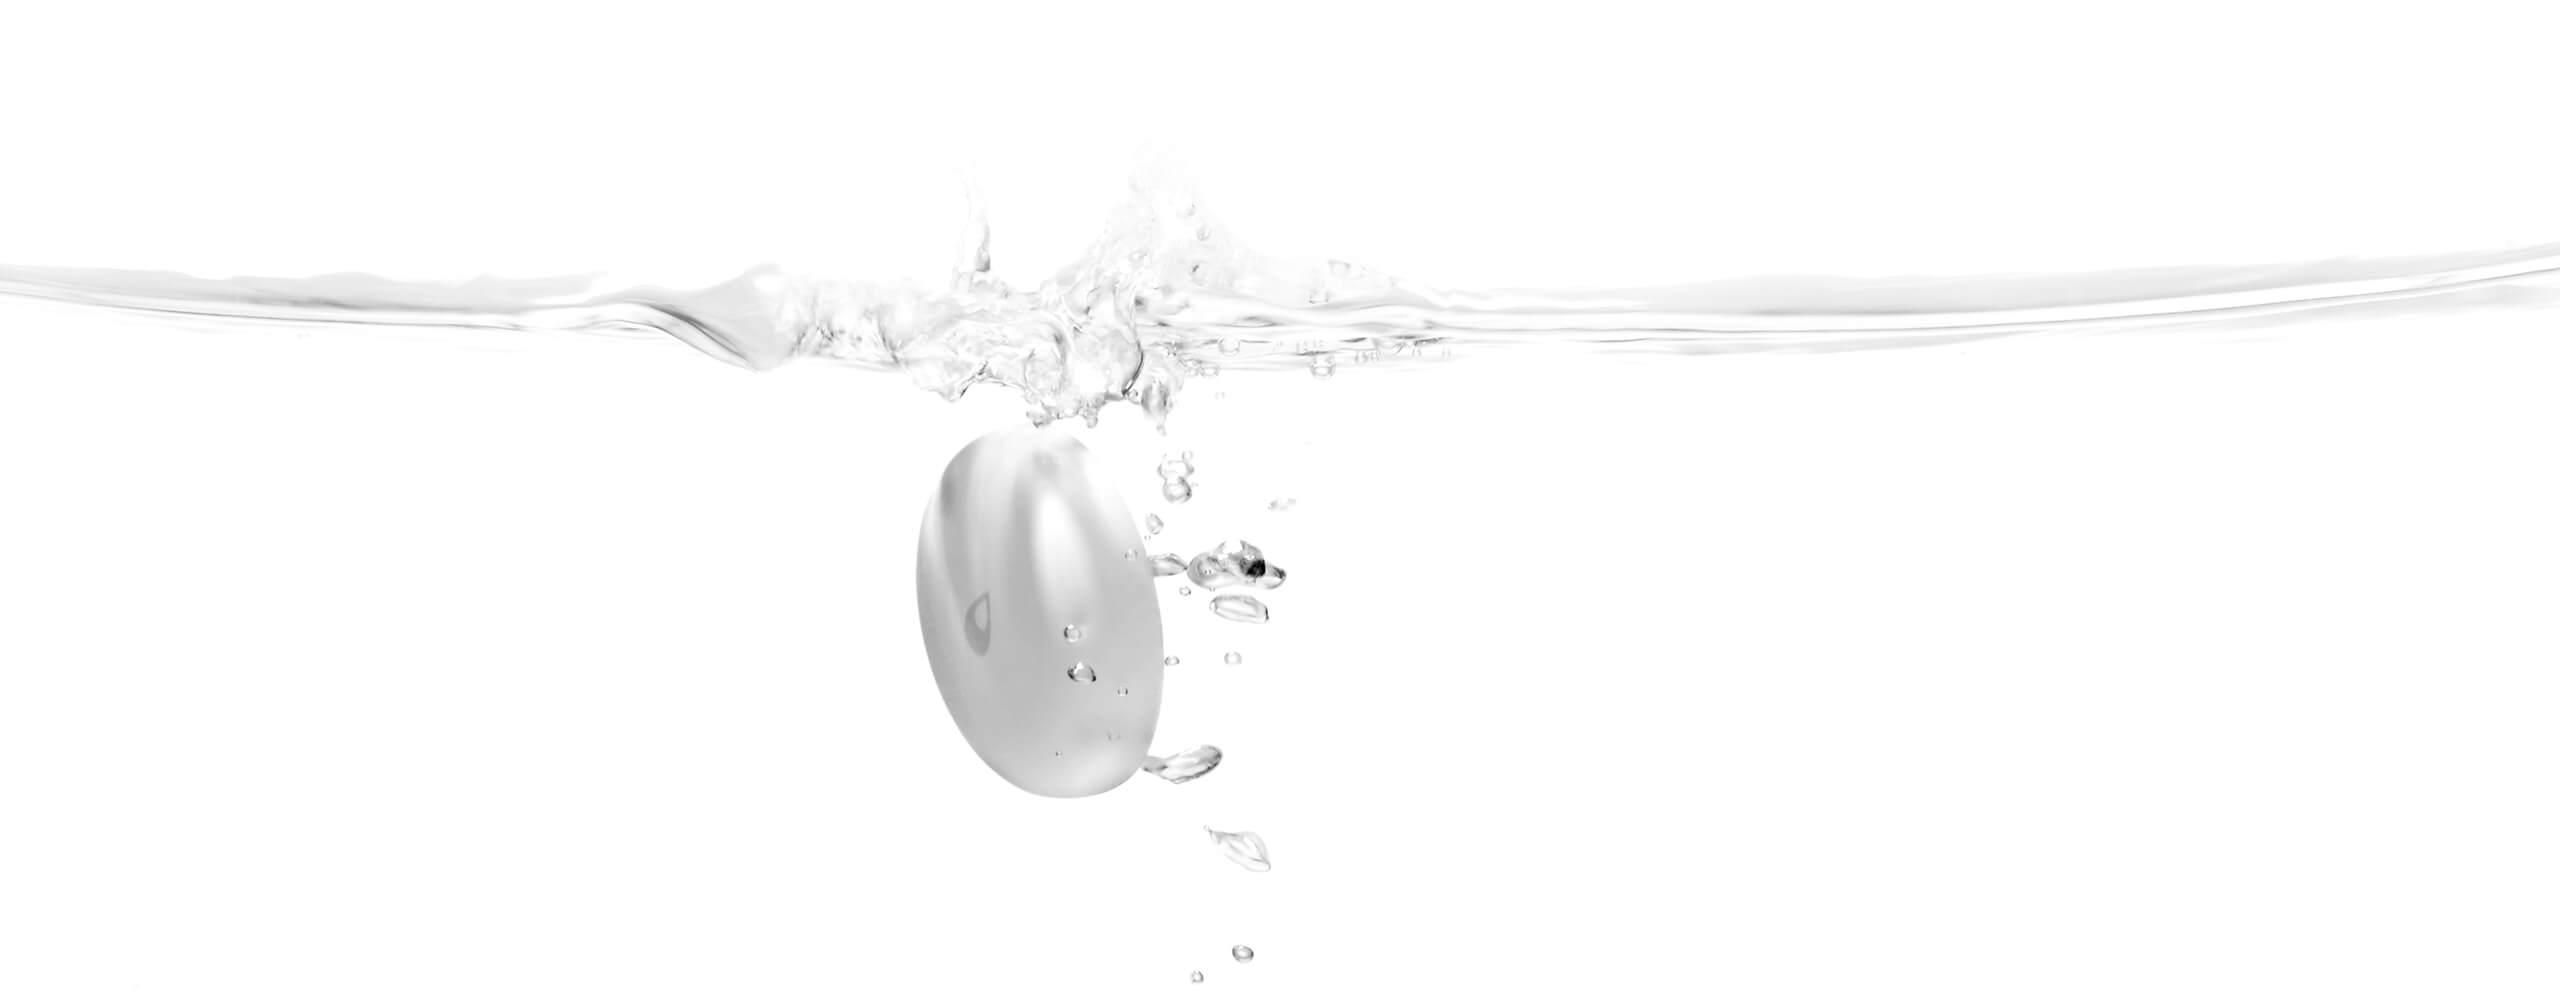 Aqara水浸传感器 - 国际防水